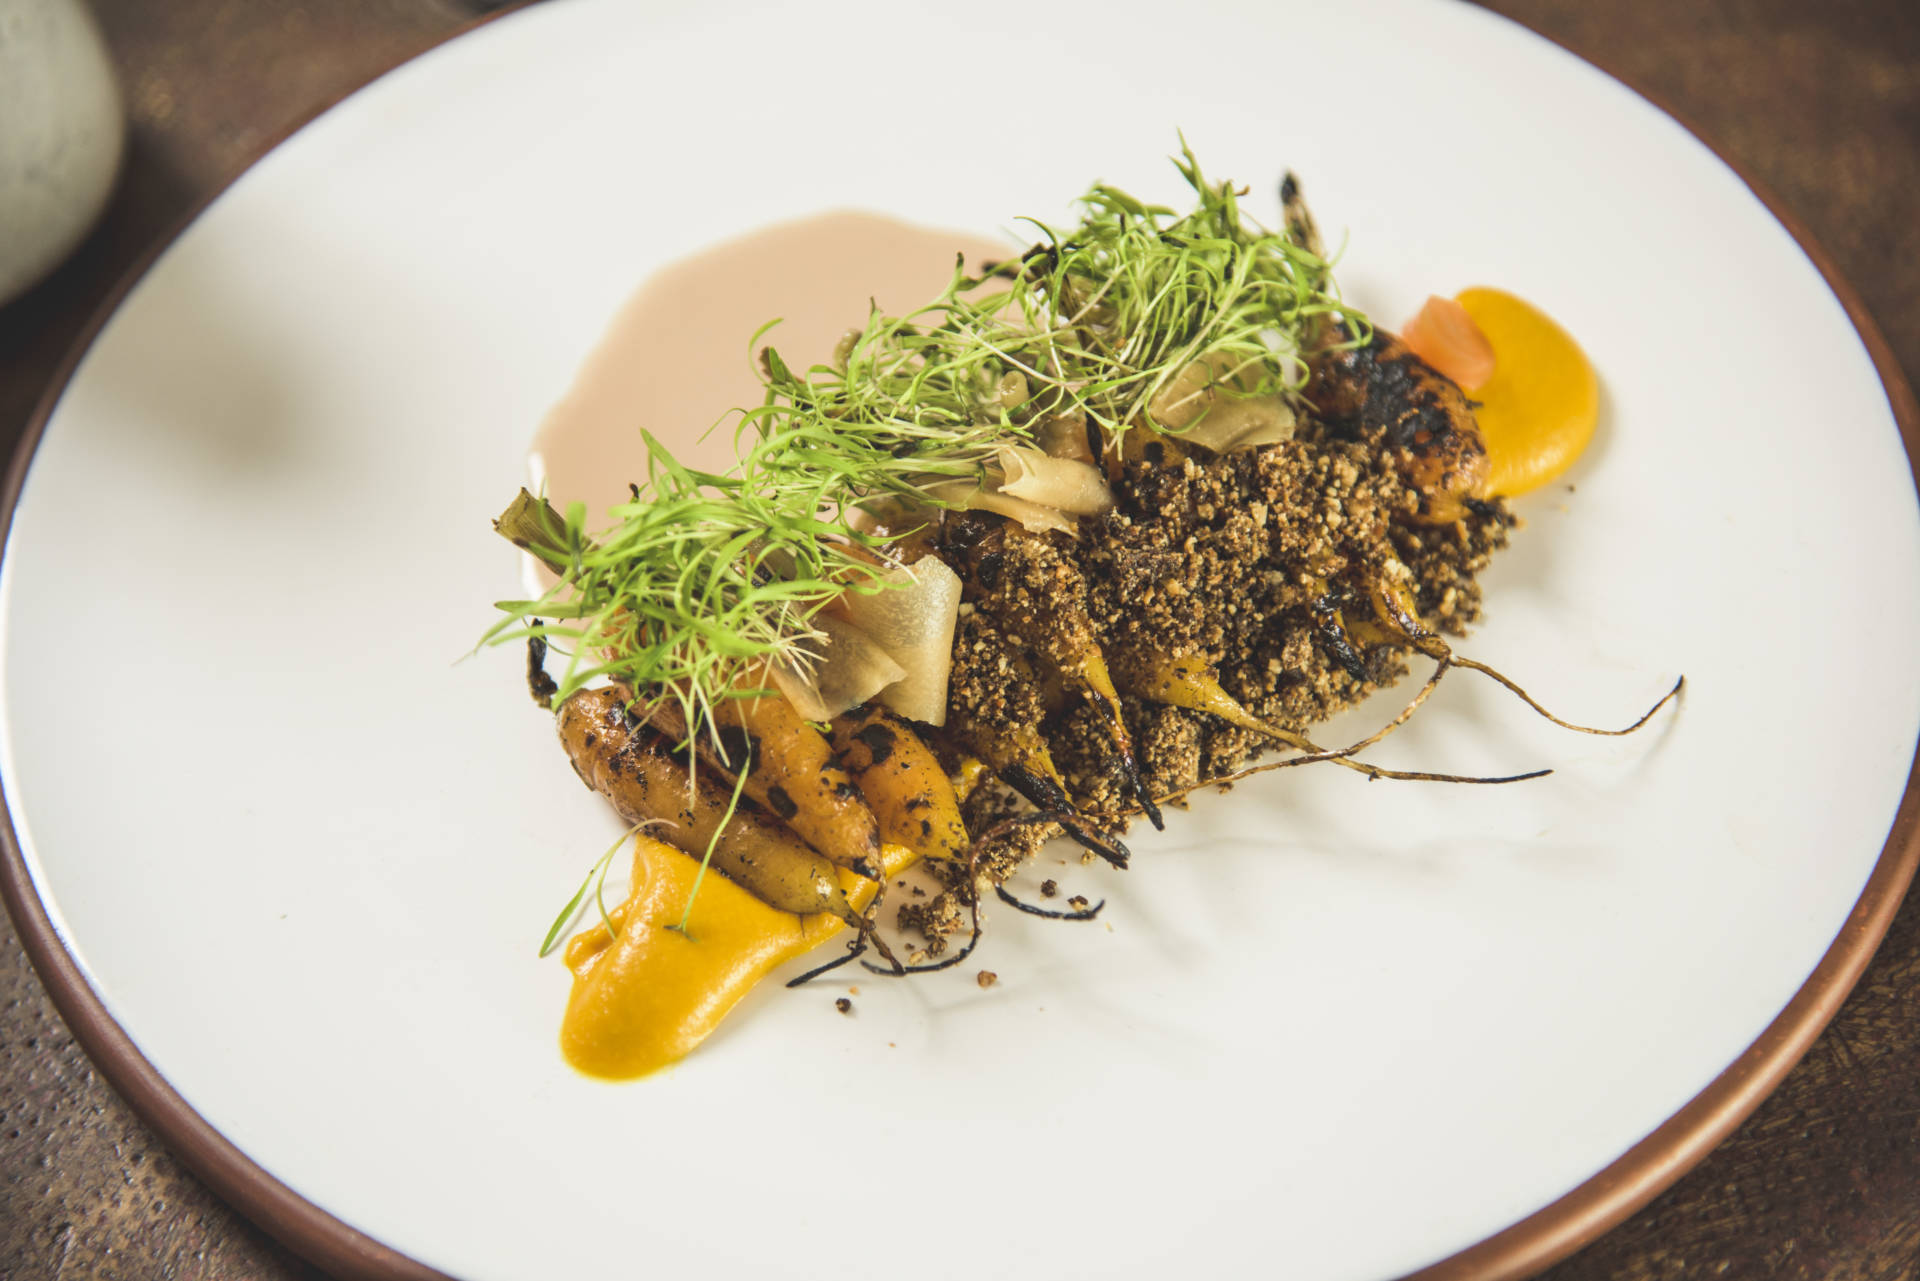 The carrot mole dish from guest chef Julio Aquilera of El Destilado in Oaxaca.